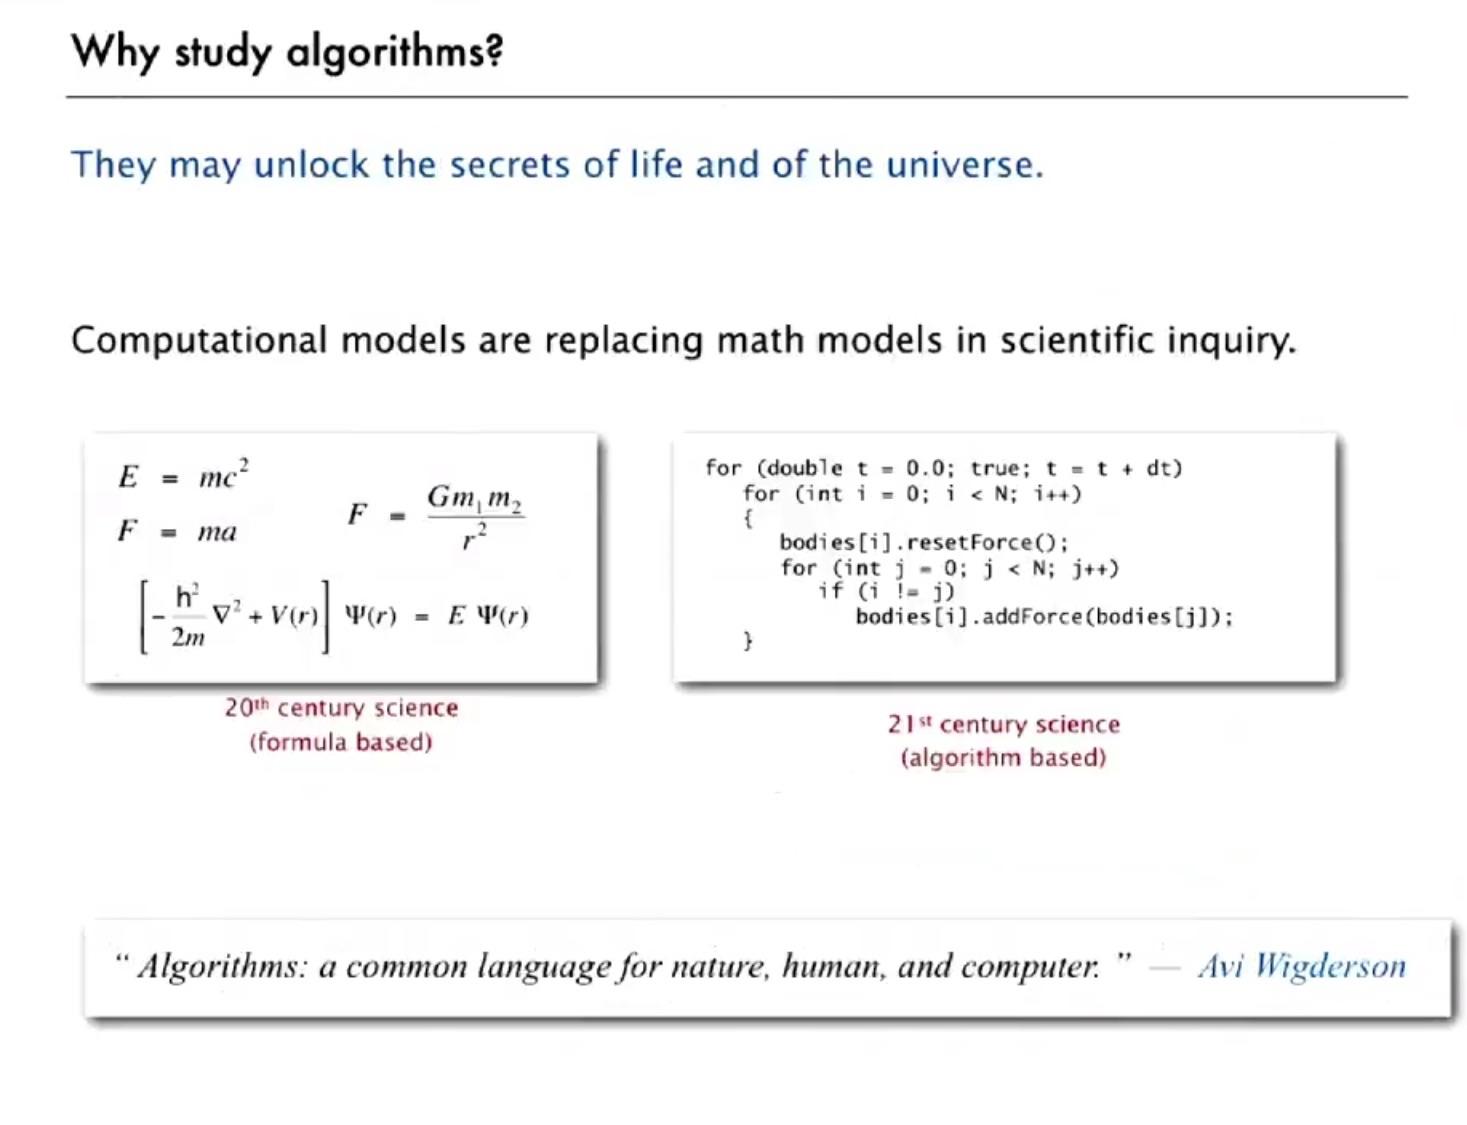 Gli algoritmi intorno a noi: recensione MOOC su Coursera